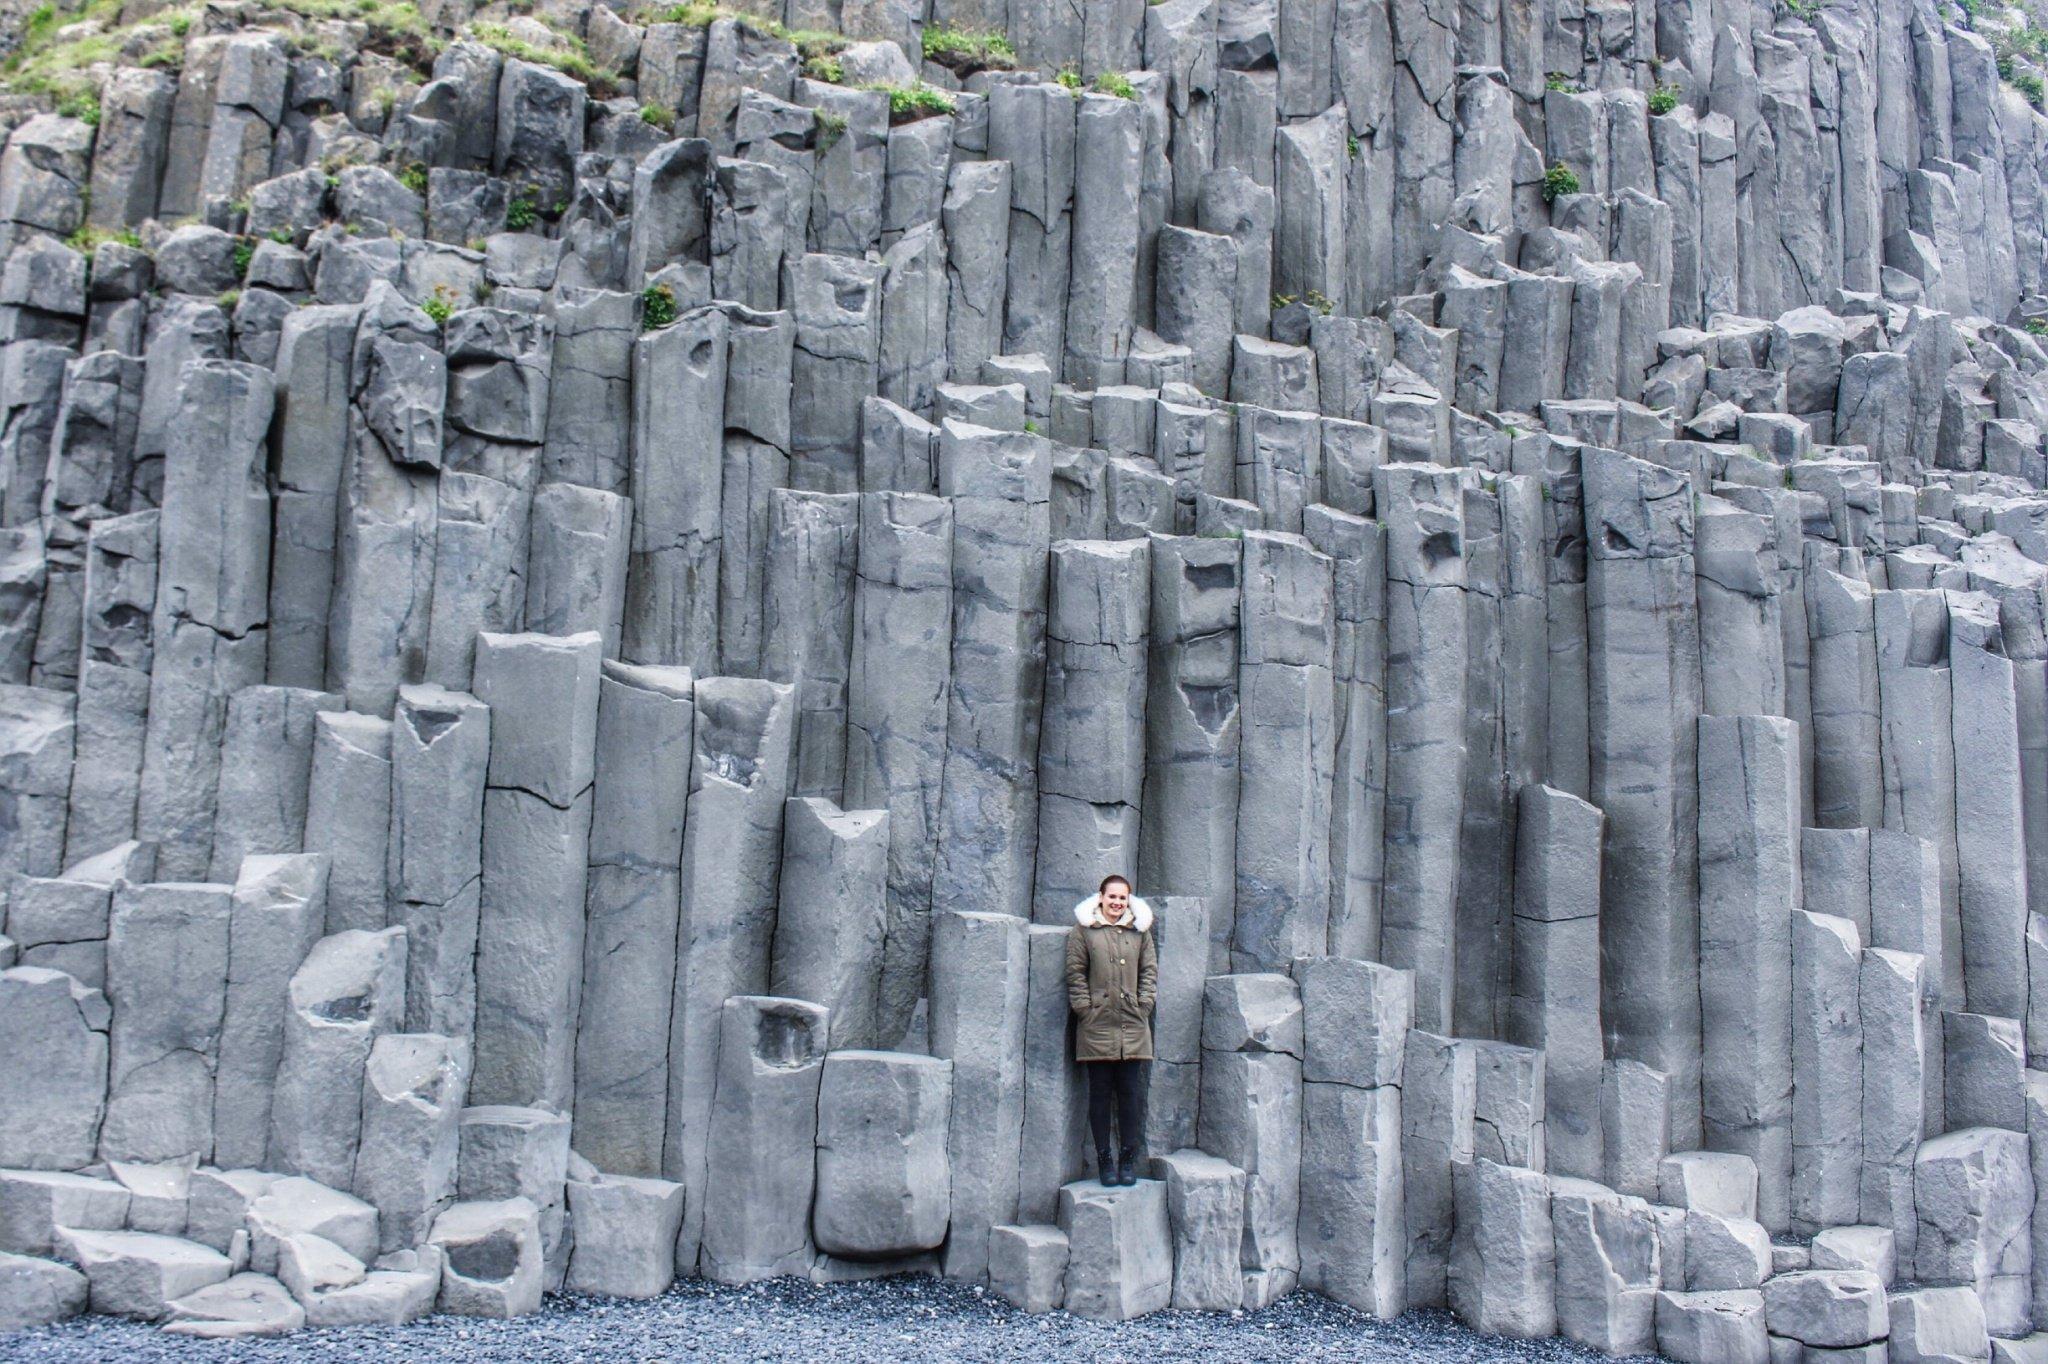 Reinisfjara black sand beach in Iceland